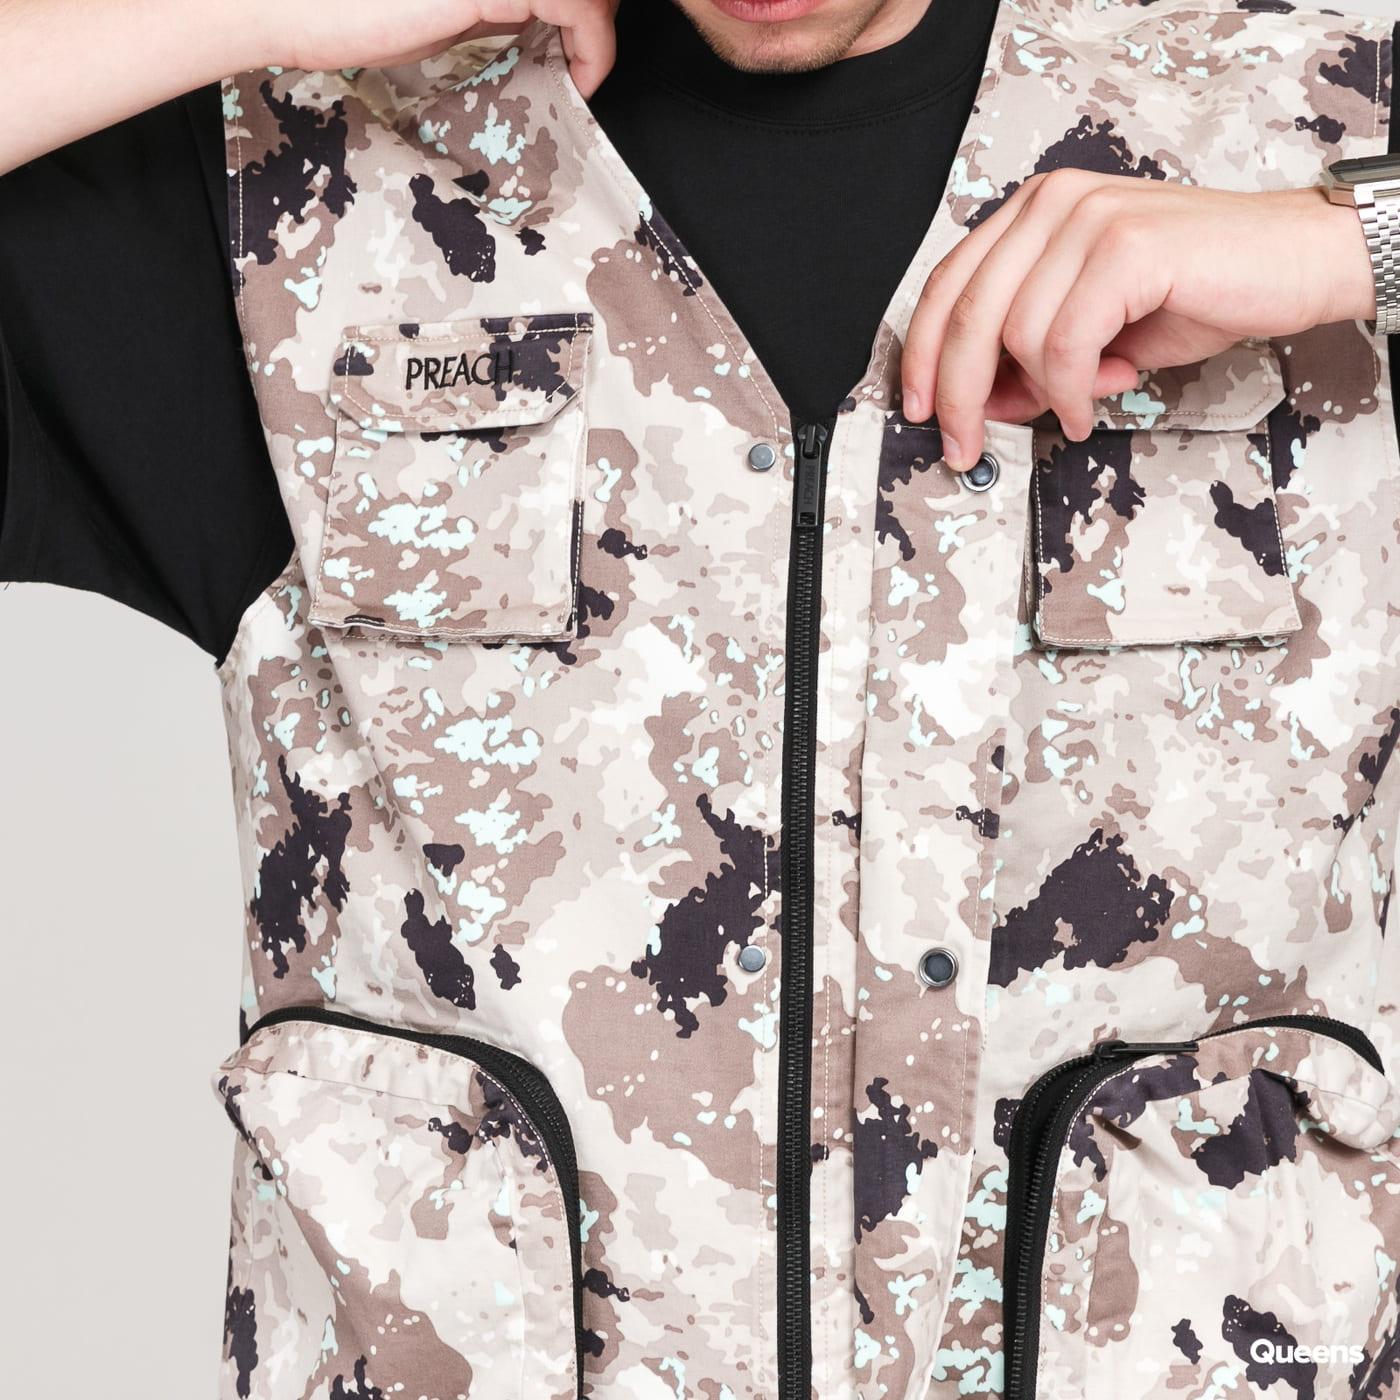 PREACH New Military Vest camo beige / brown / black / light mint